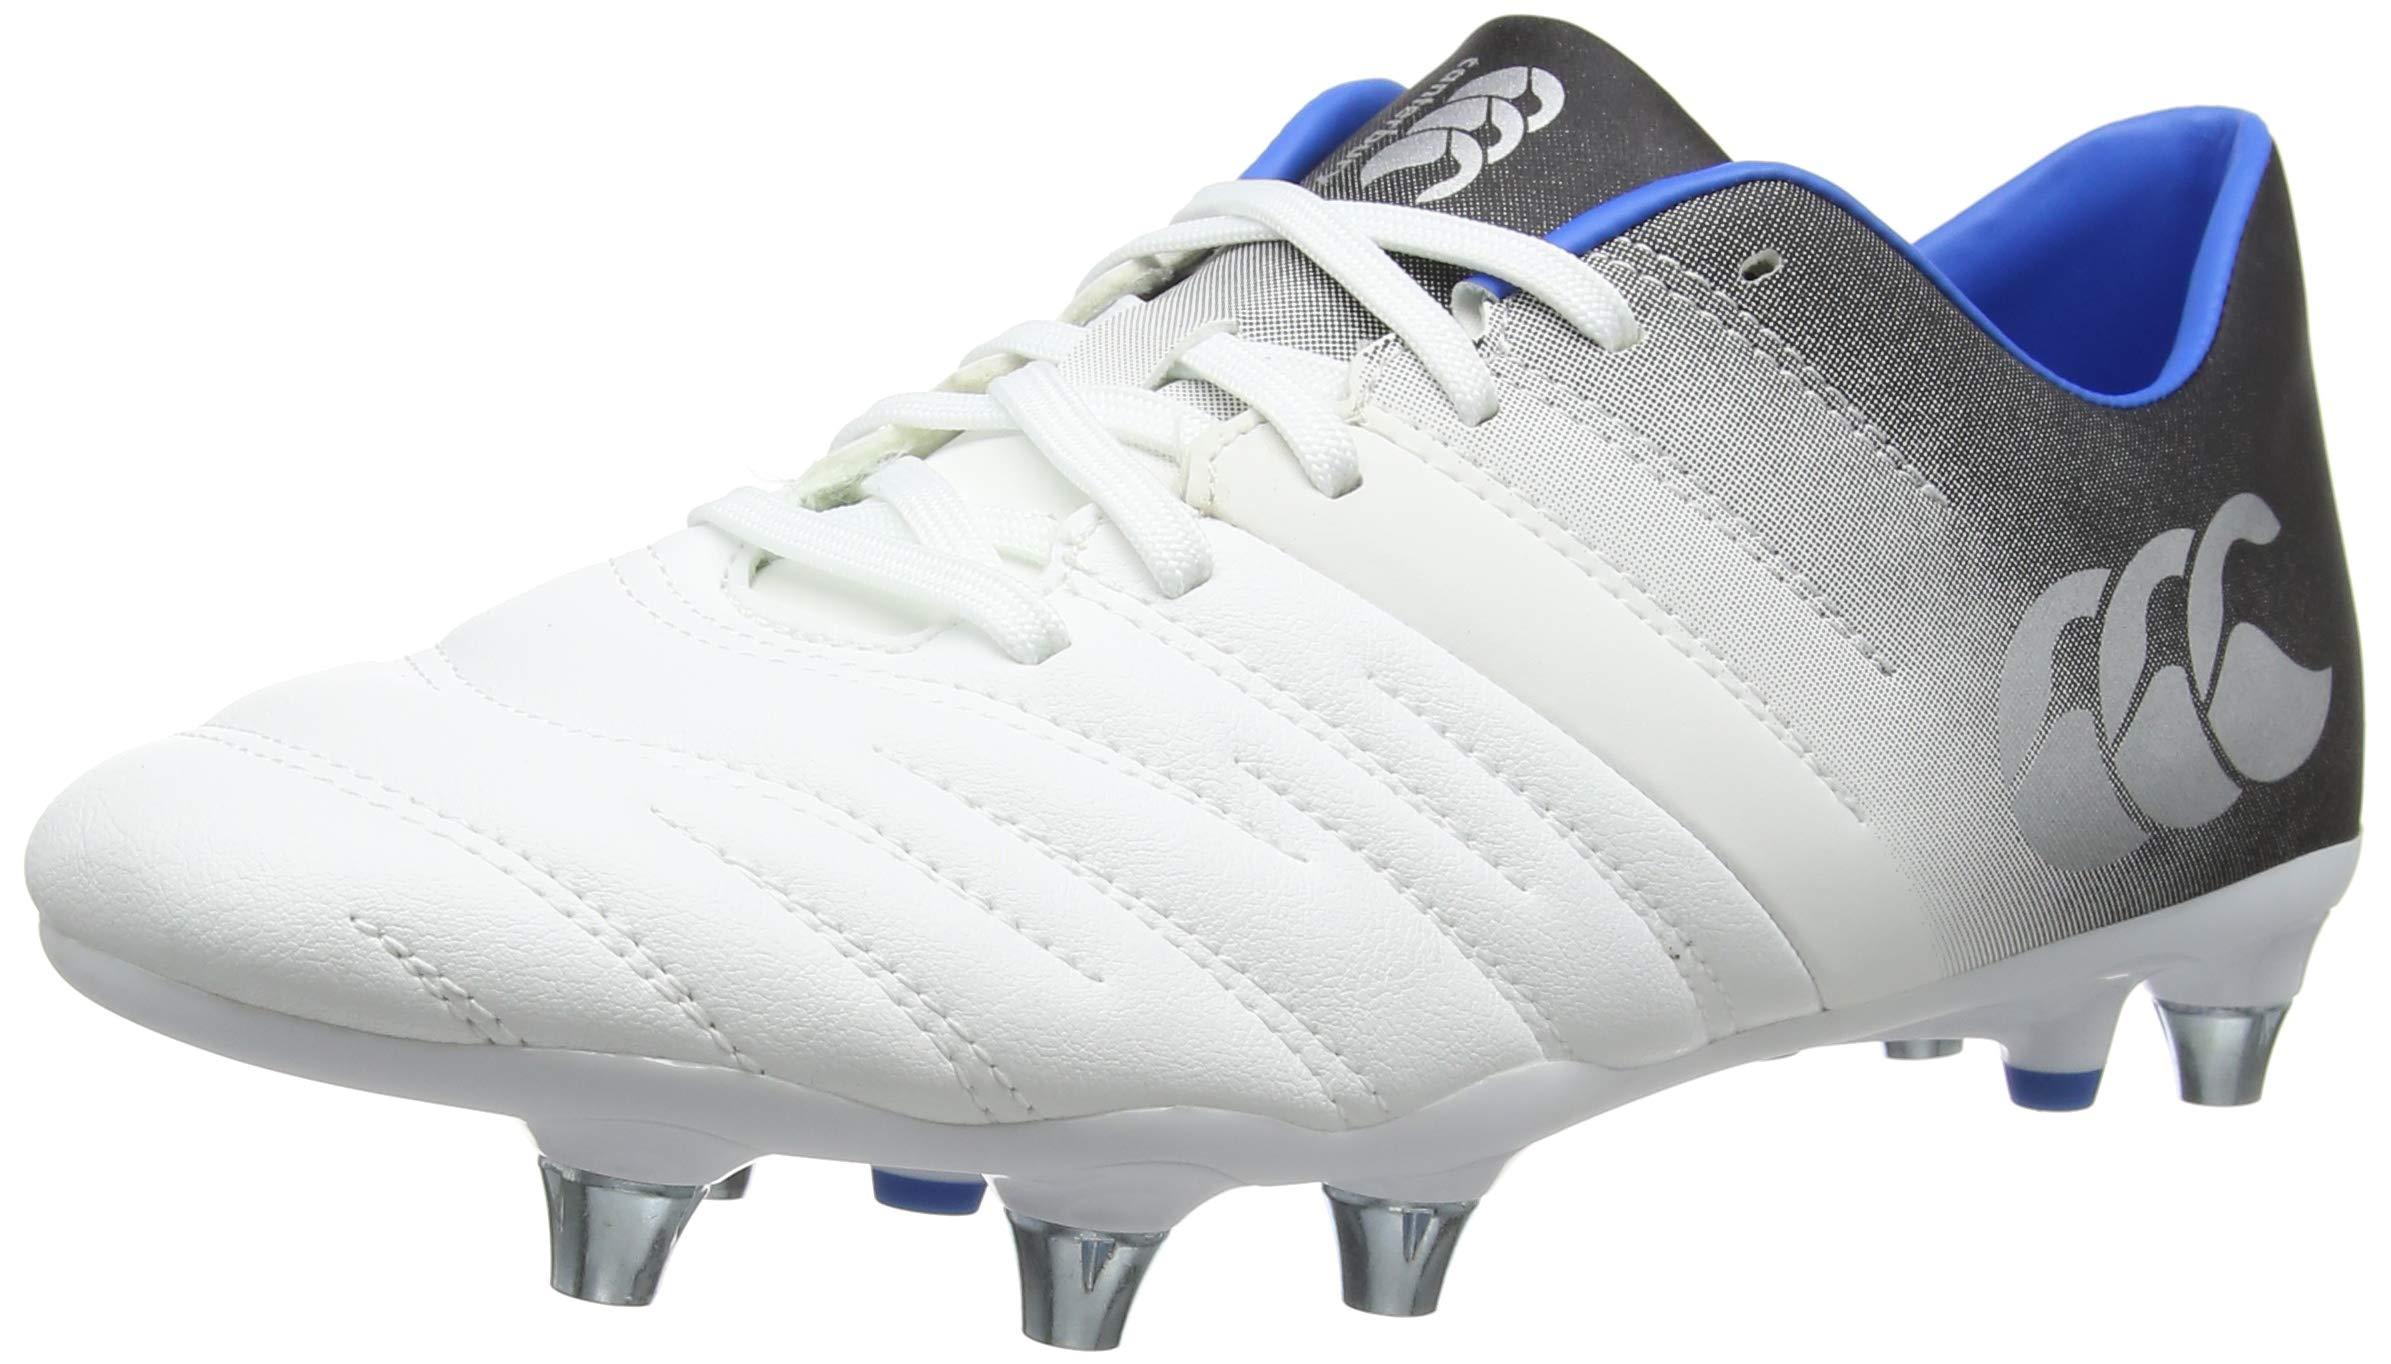 Rugby 00147 De 2 HommeBlancoptic White Canterbury Phoenix 5 0 Eu Soft GroundChaussures CxWBQdoeEr